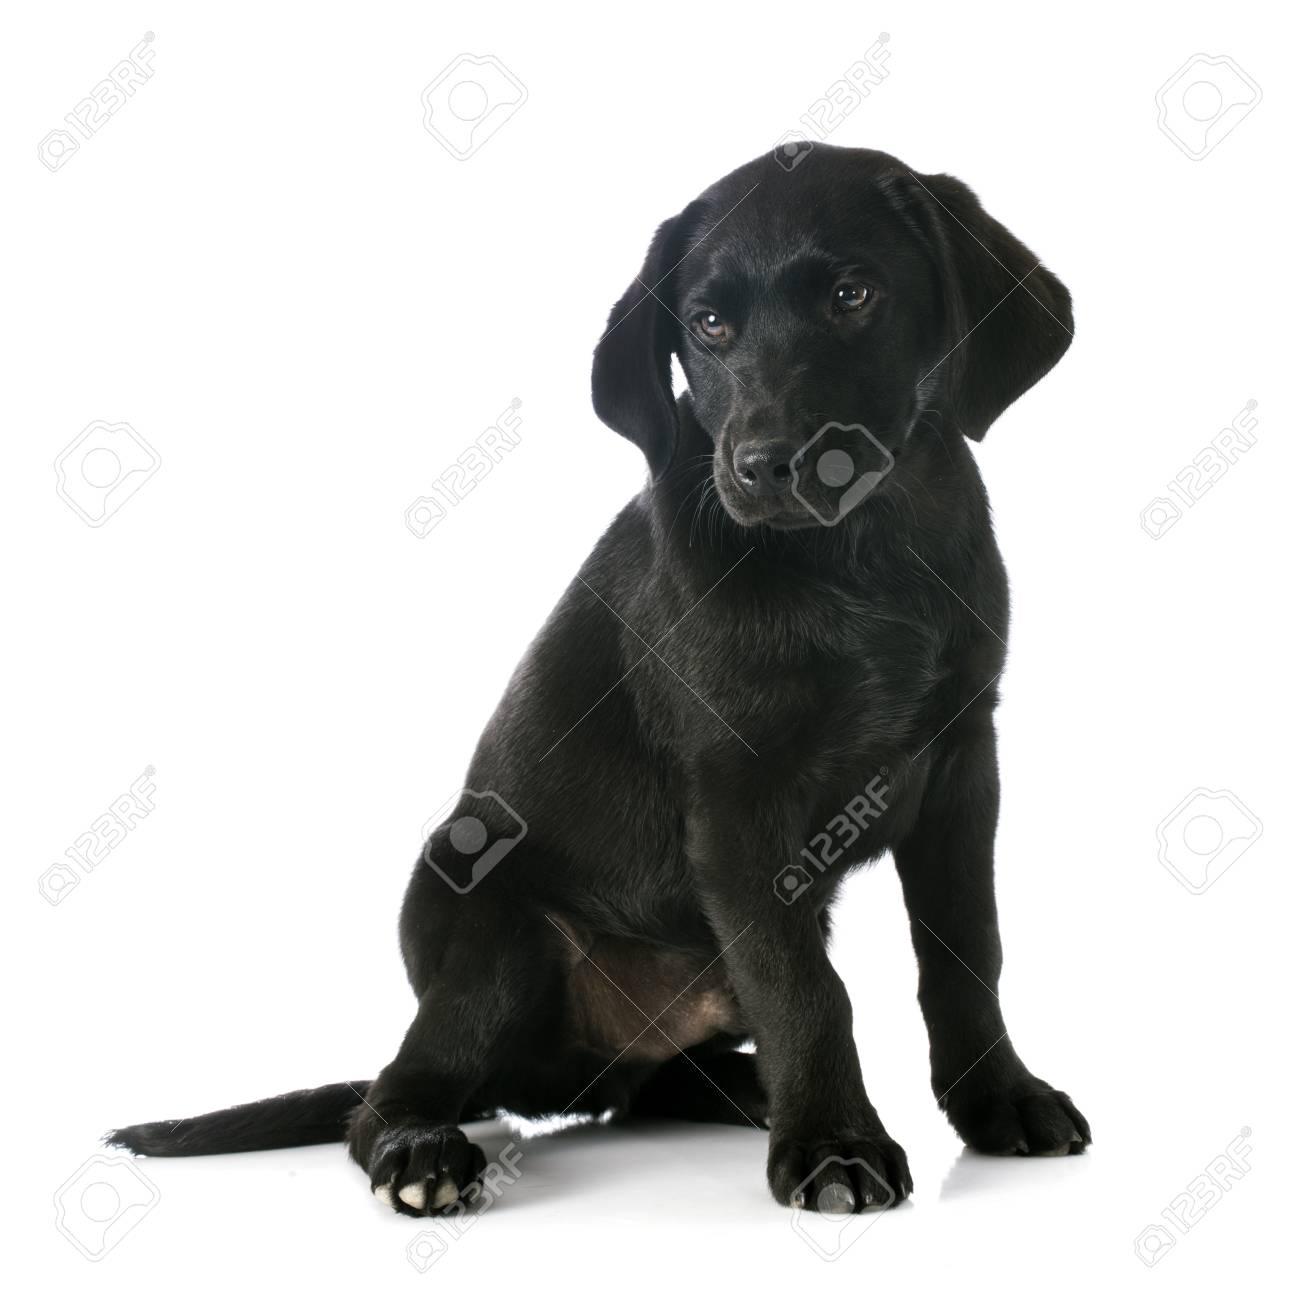 Puppy Purebred Labrador Retriever In Front Of White Background Stock